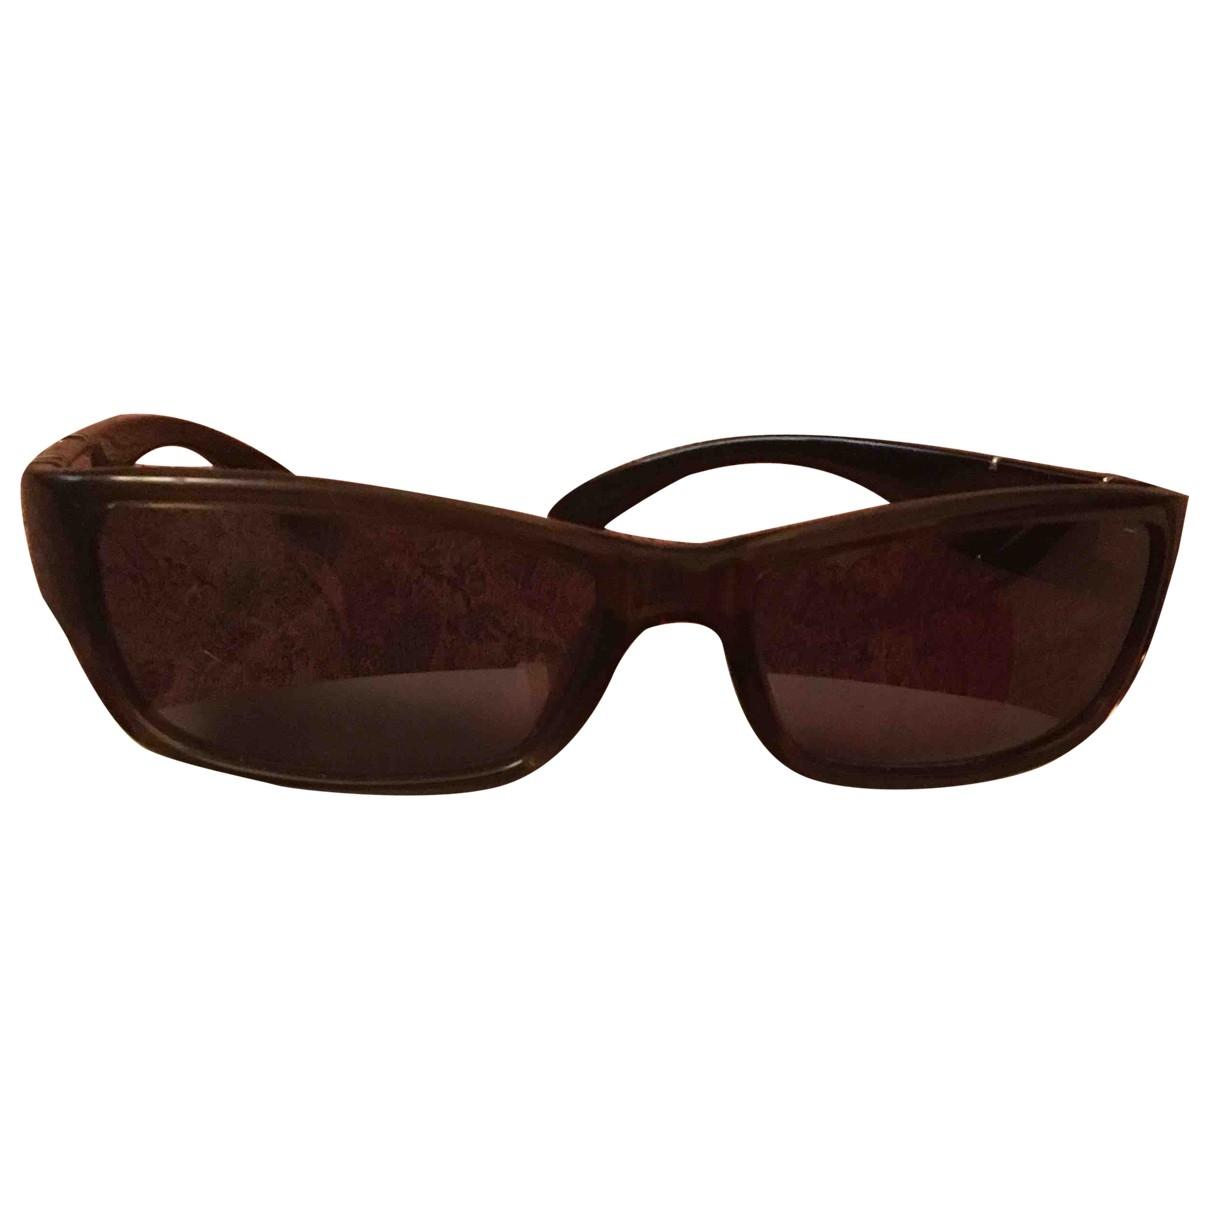 D&g \N Brown Sunglasses for Women \N